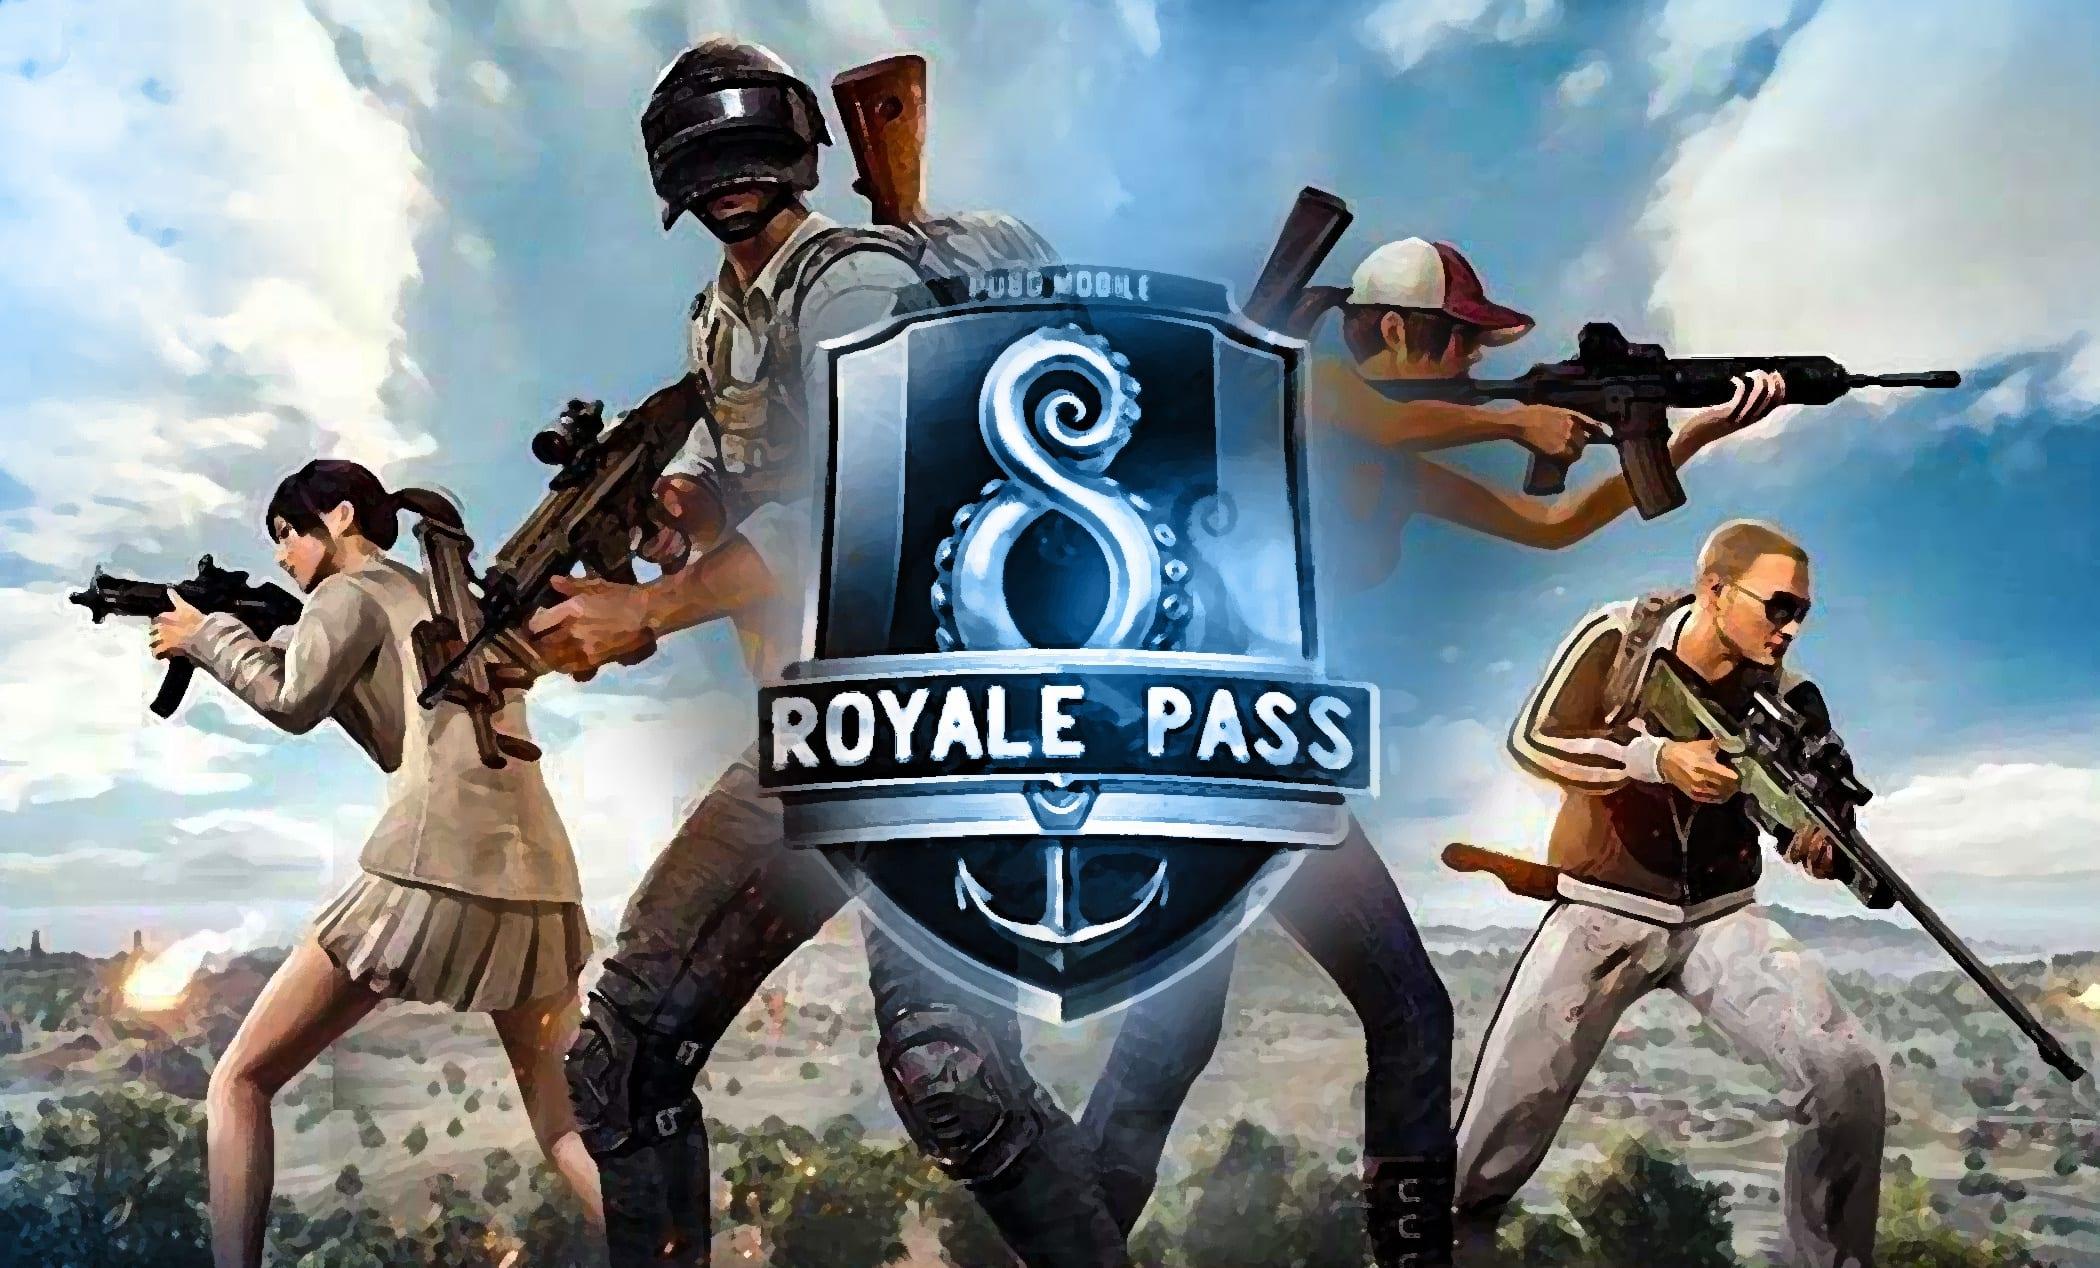 Pubg Mobile Season 8 Royal Pass New Gun Skins And More